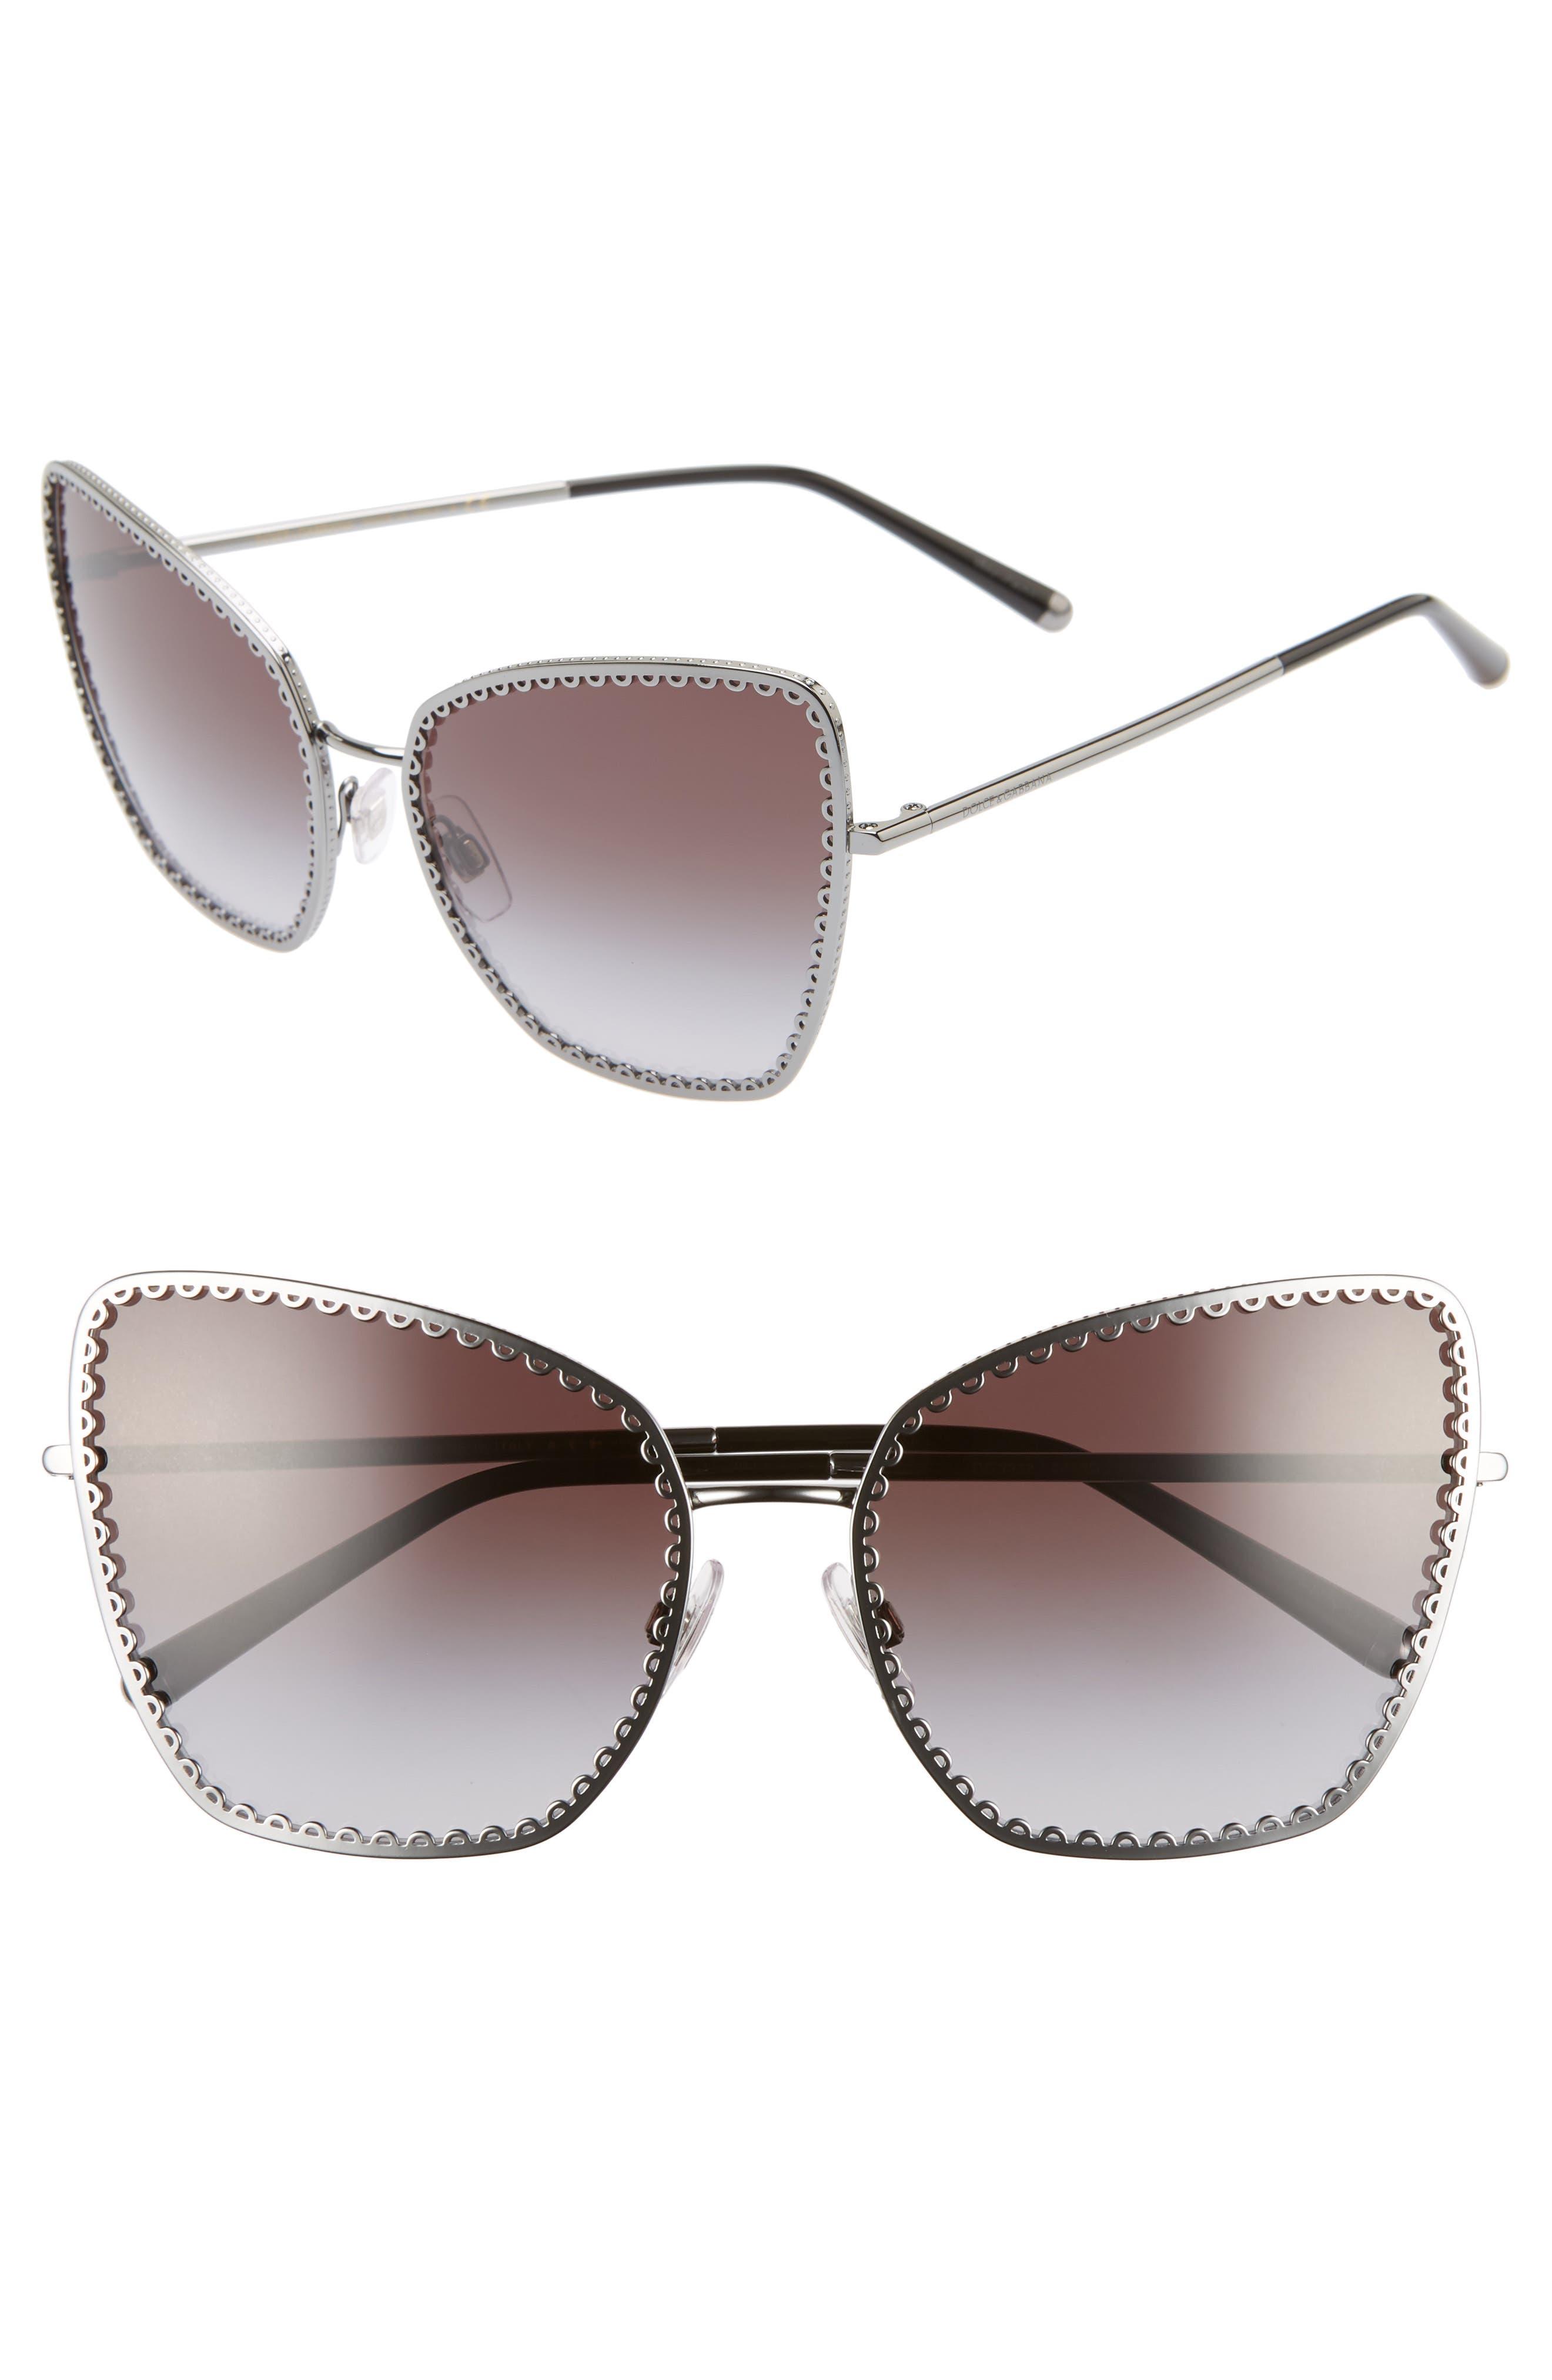 Dolce & gabbana Sacred Heart 61Mm Gradient Cat Eye Sunglasses - Gunmetal Gradient